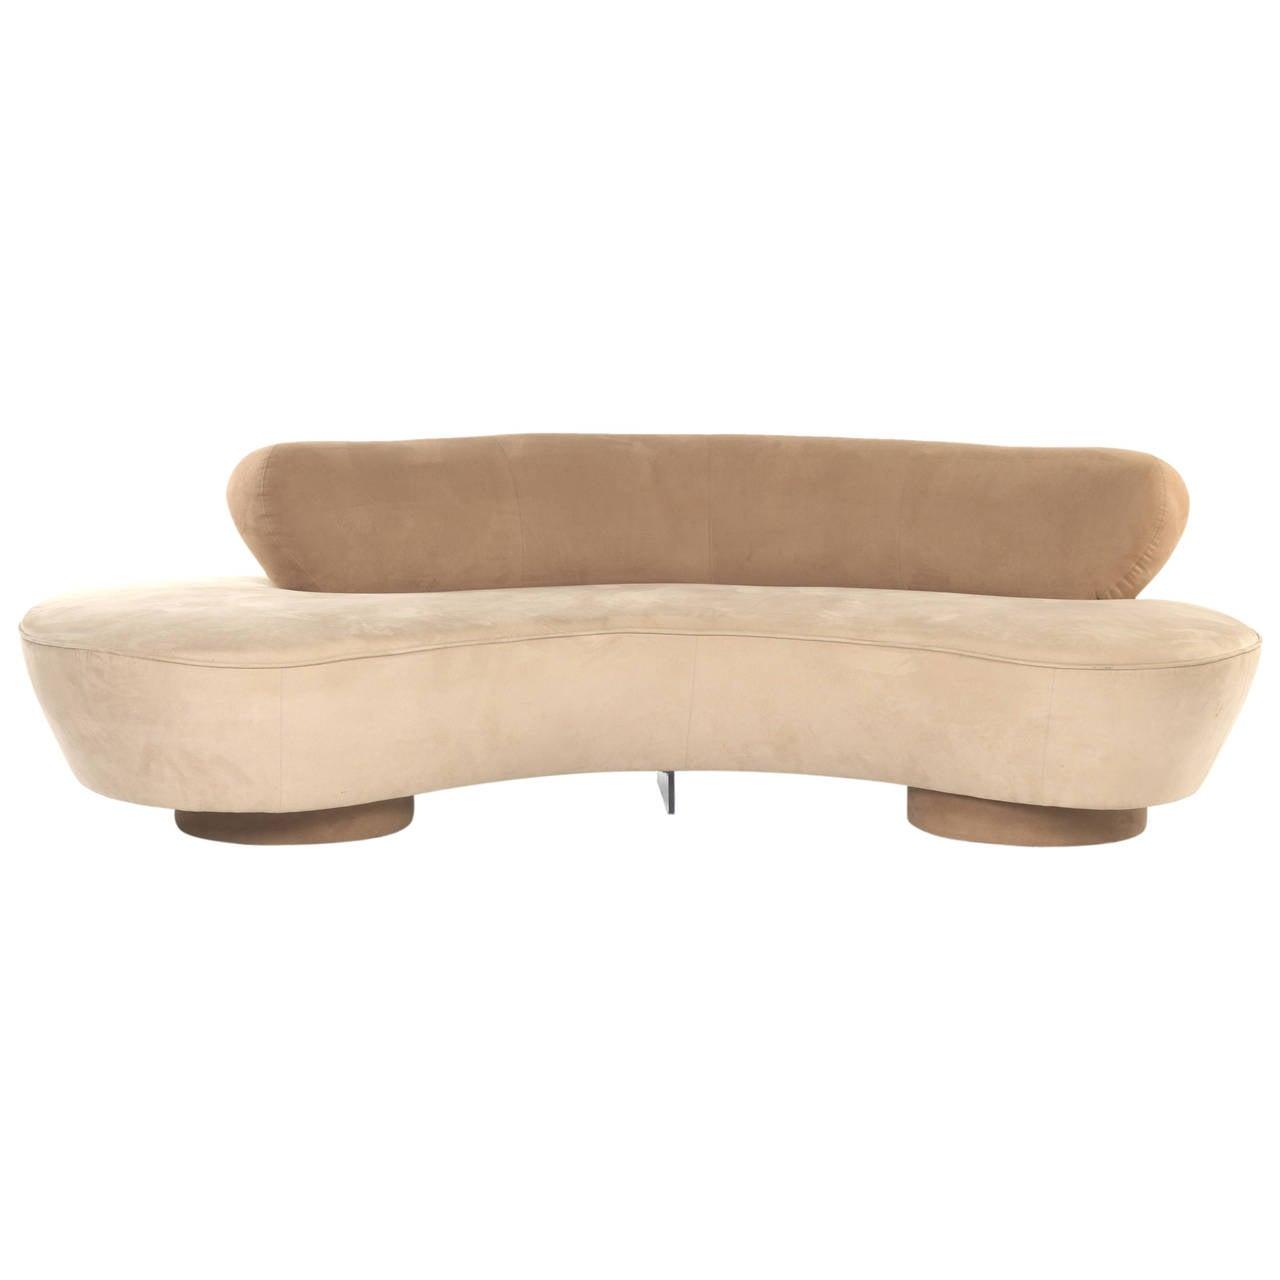 Vladimir Kagan 39 S Cloud Sofa By Directional For Sale At 1stdibs